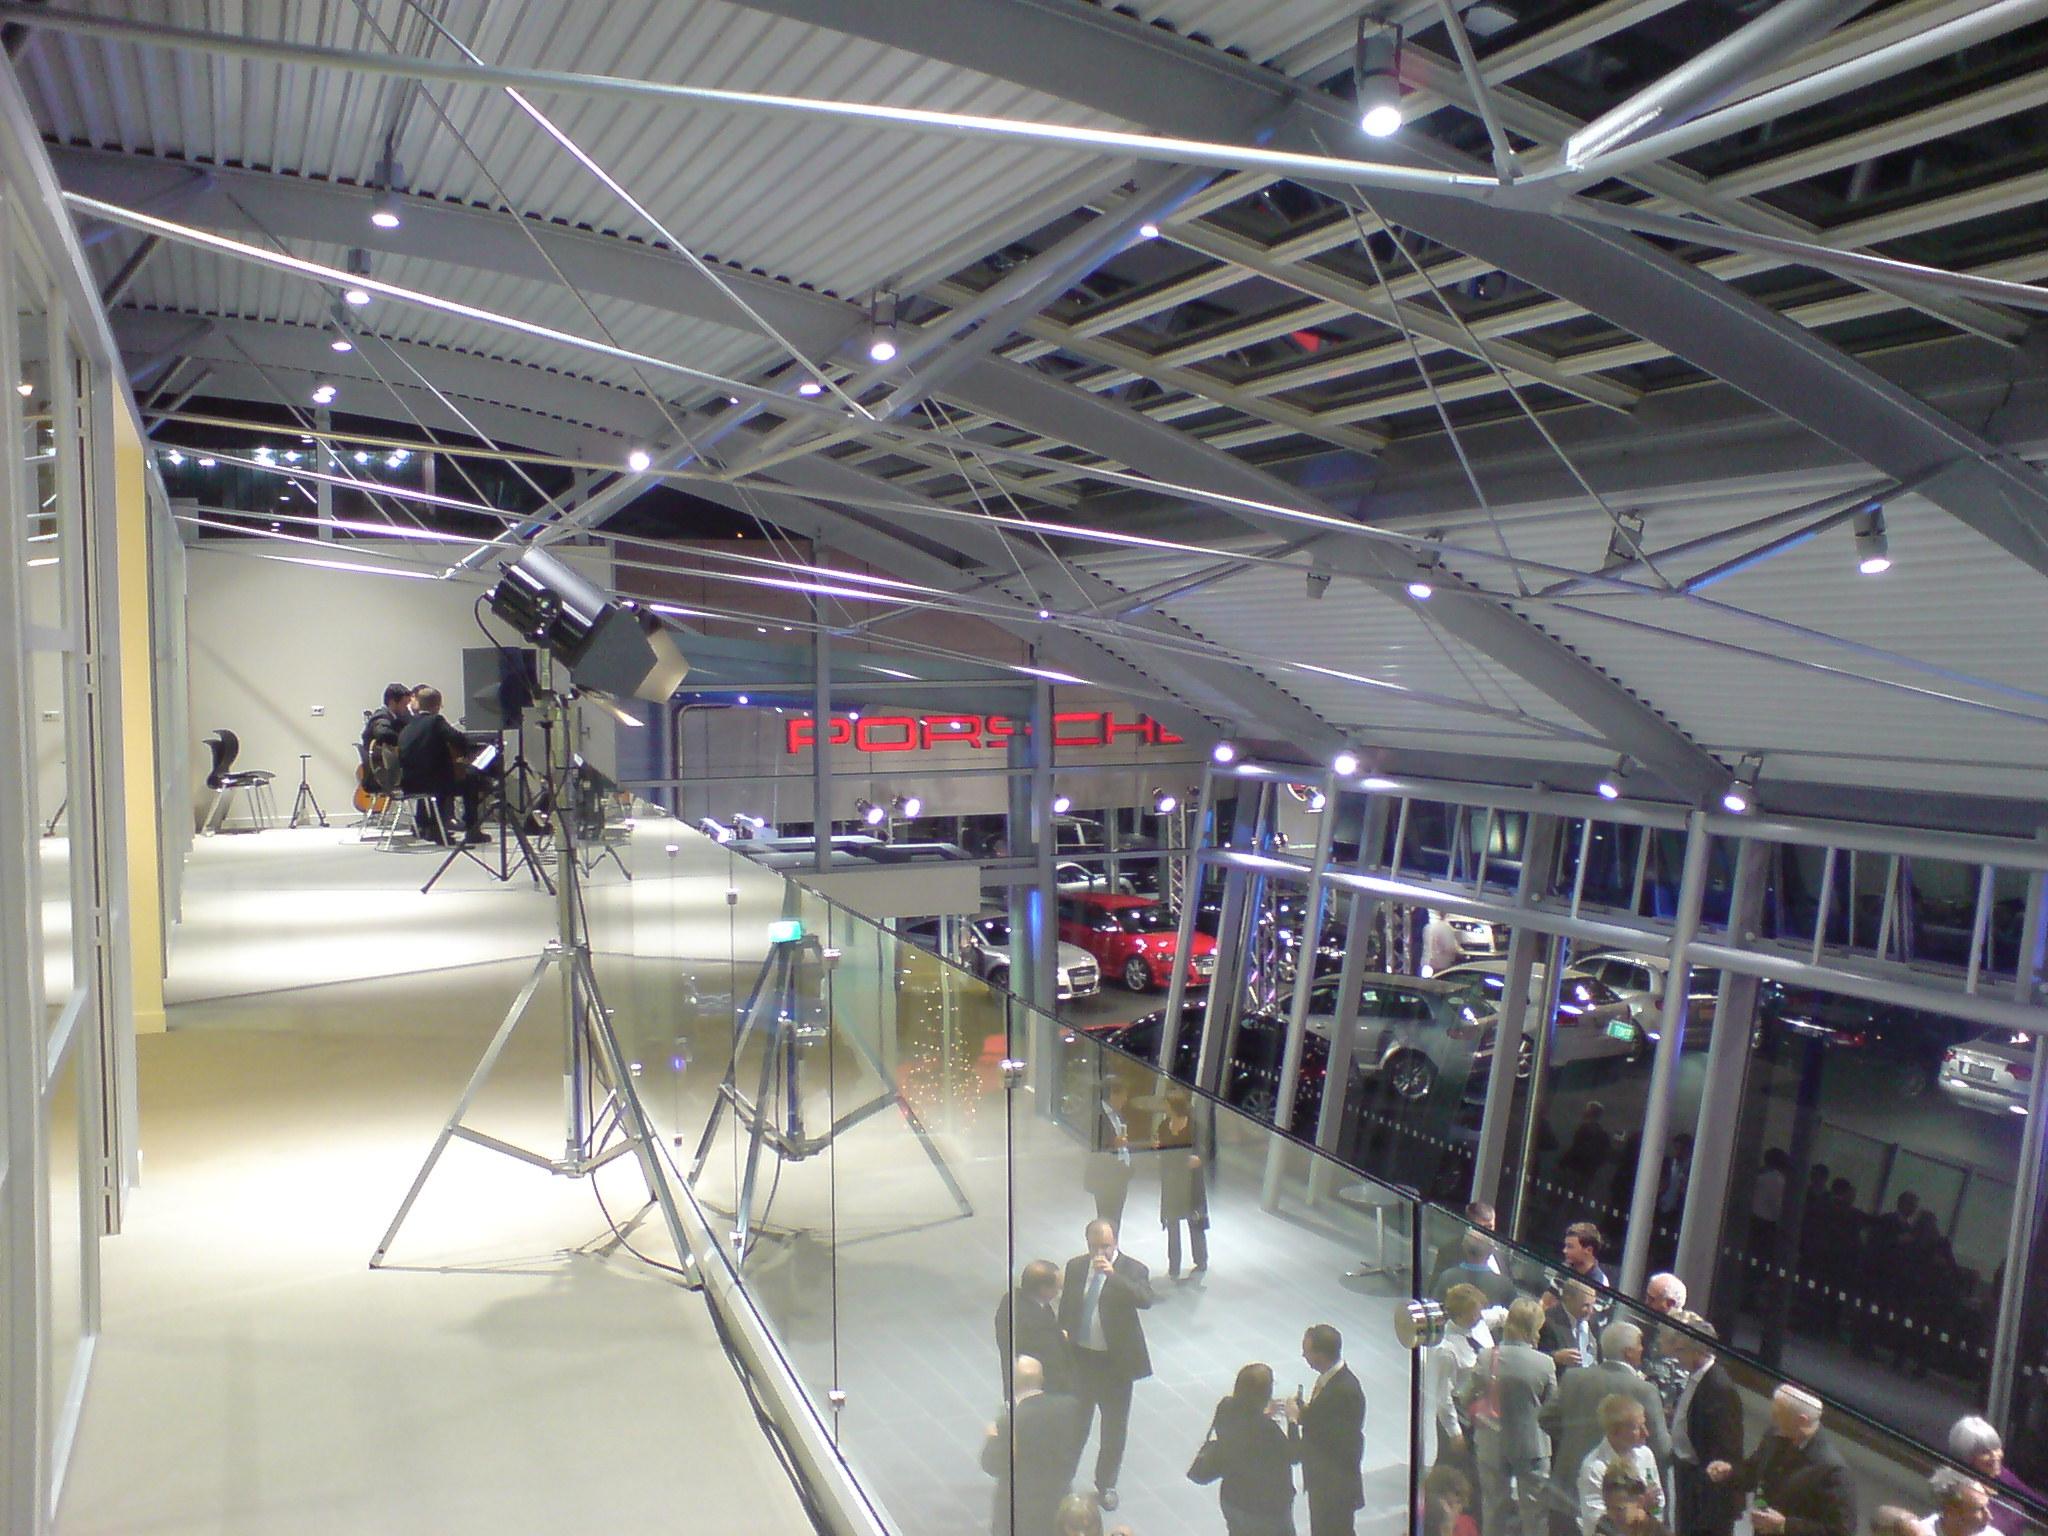 Armstrong Prestige AUDI Hanger Internal Mezzanine